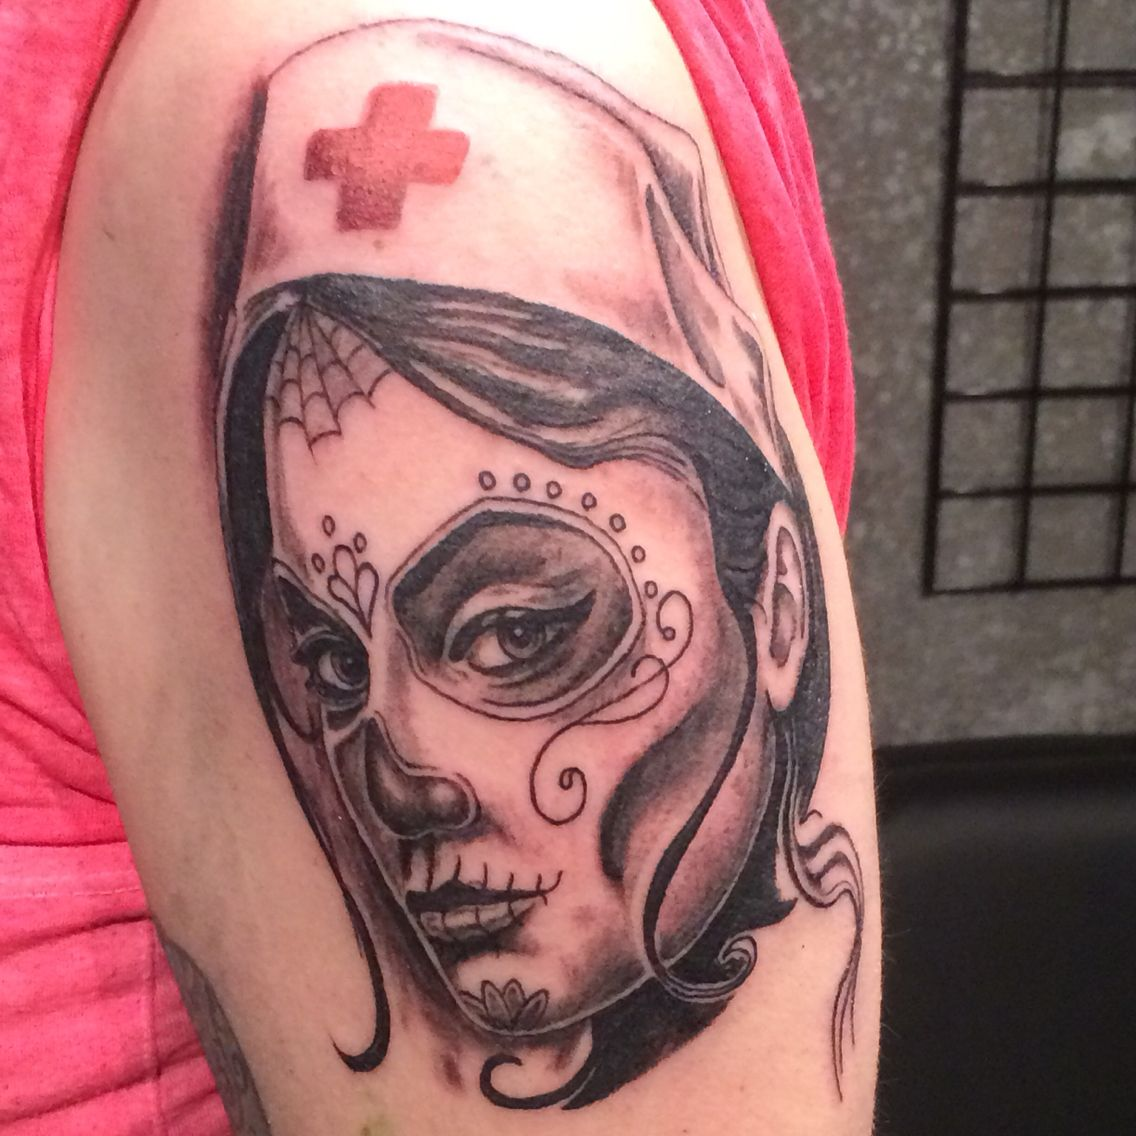 Tattoos tattoo ideas on pinterest rn - Day Of The Dead Nurse Tattoo